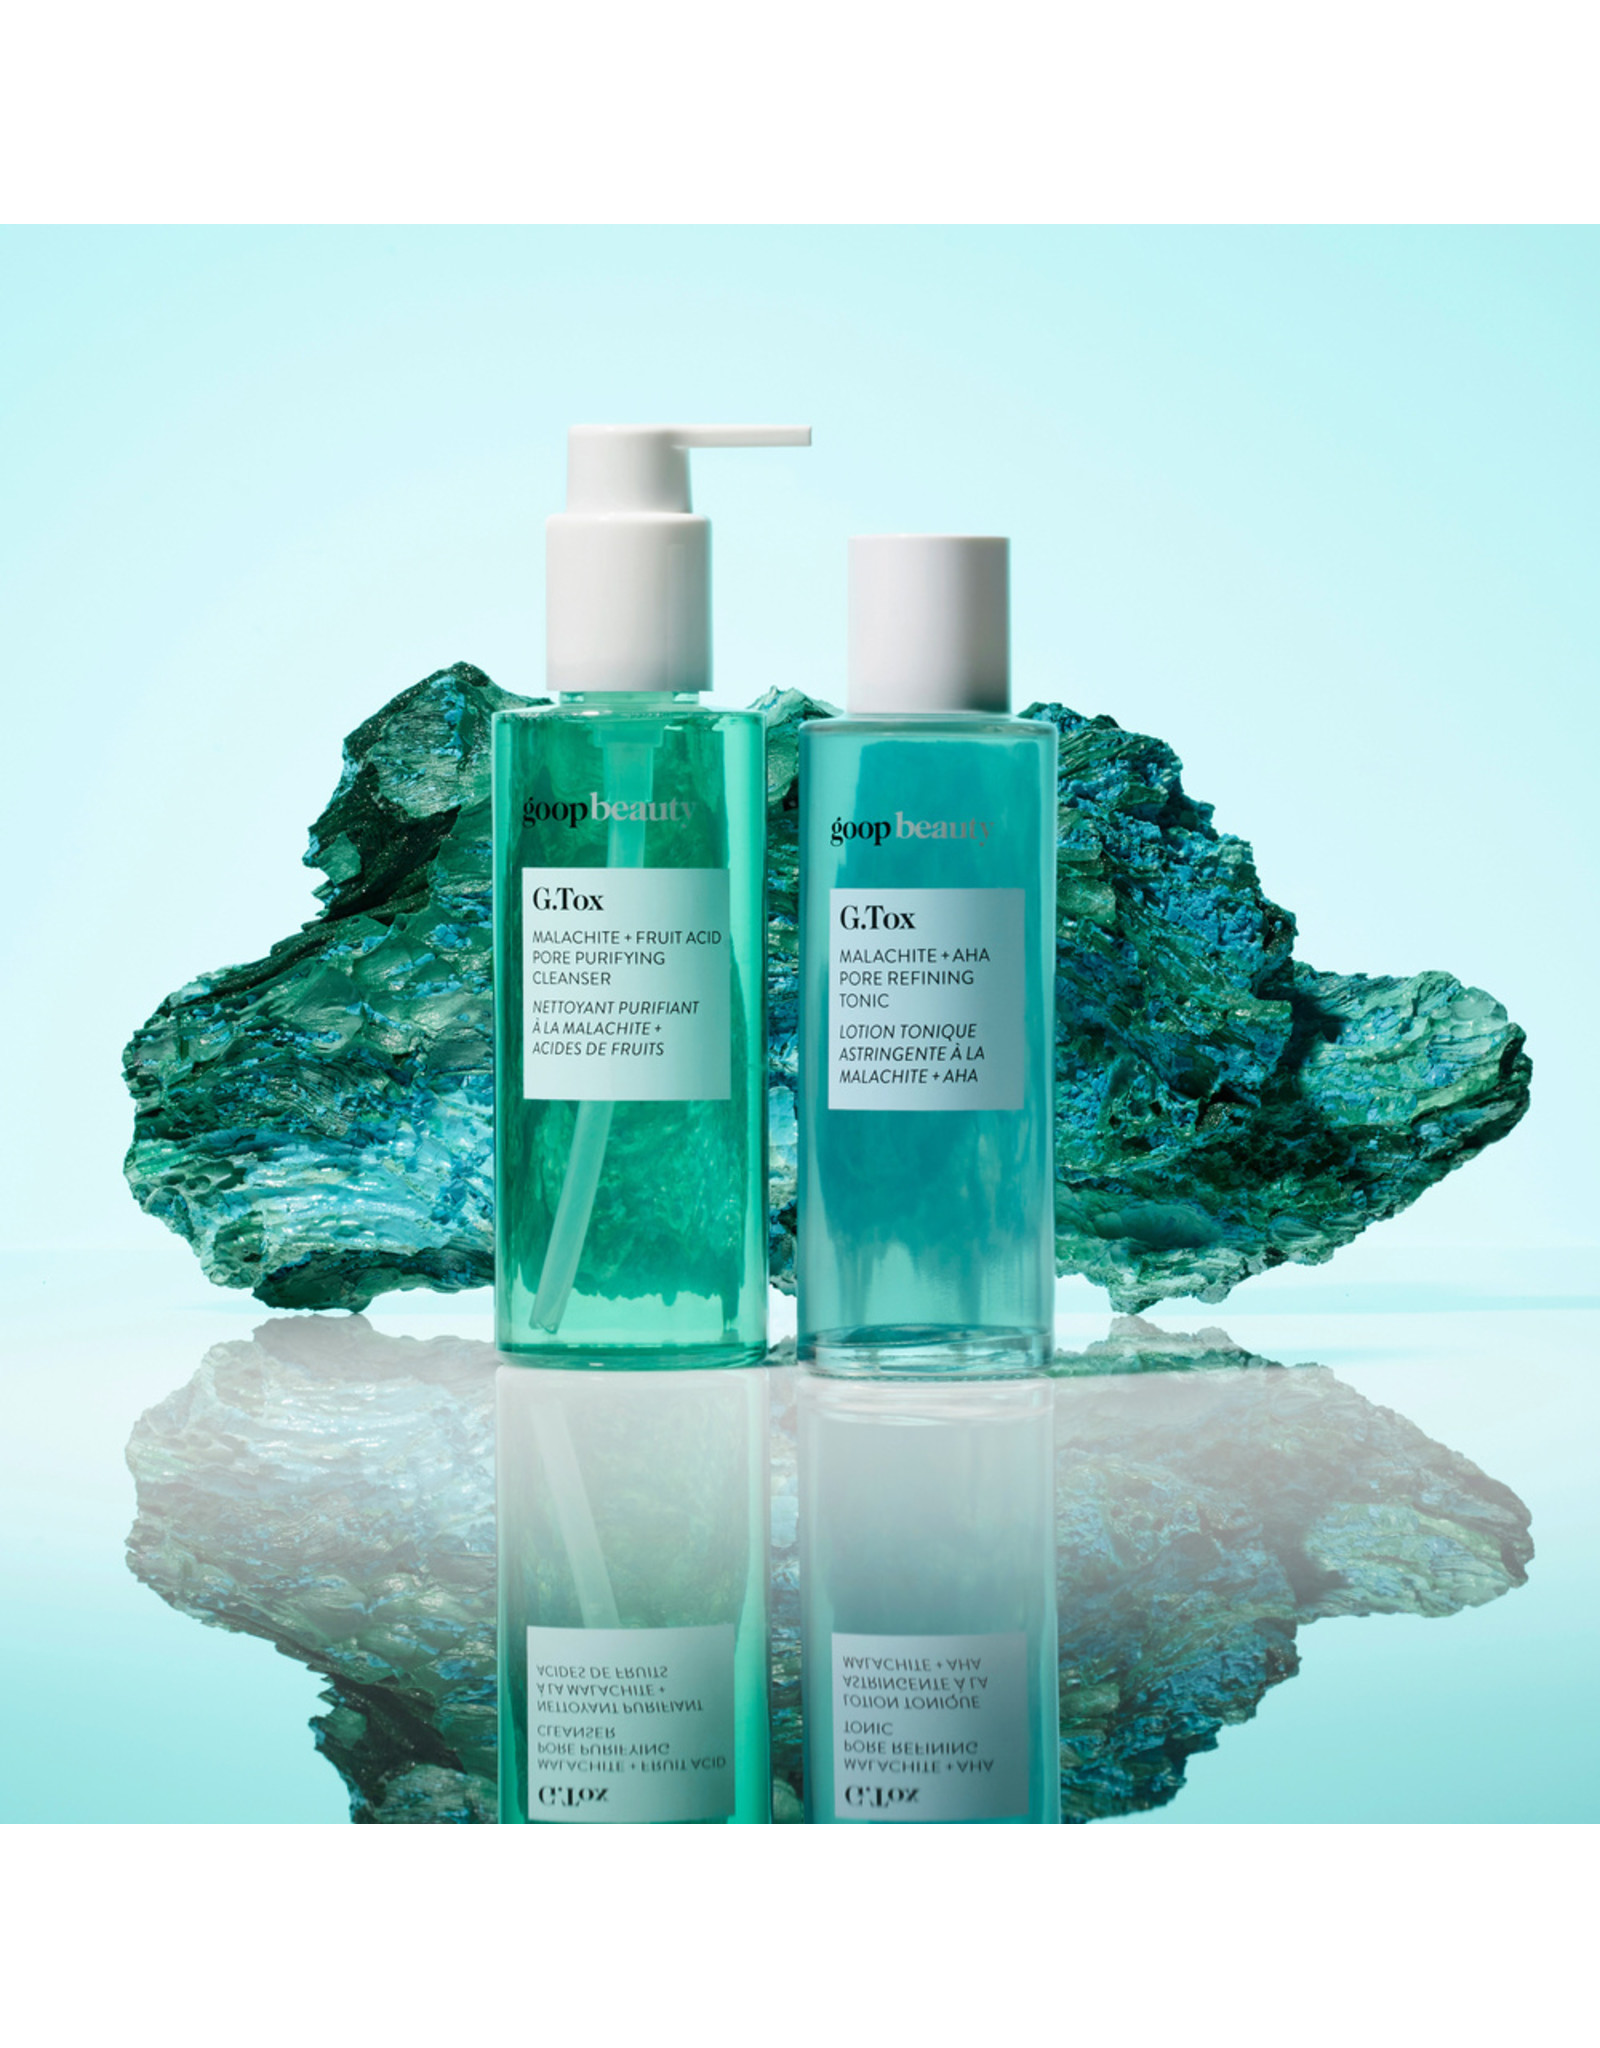 goop Beauty G.TOX Malachite + Fruit Acid Pore Purifying Cleanser (Size: 5 fl oz)